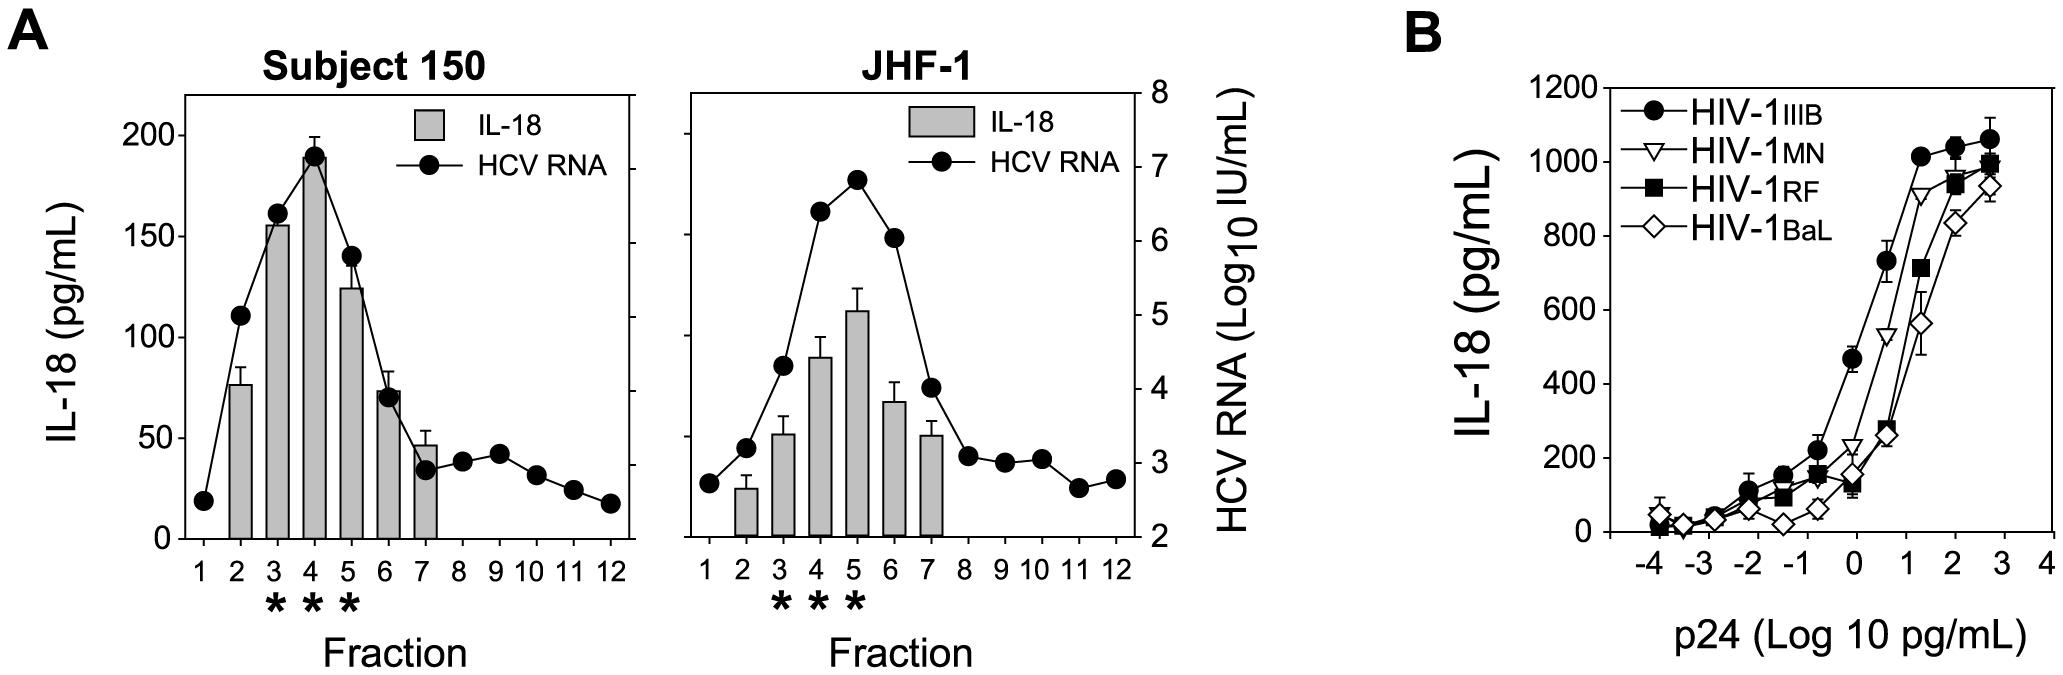 HCV and HIV virions stimulate monocytes to produce IL-18.